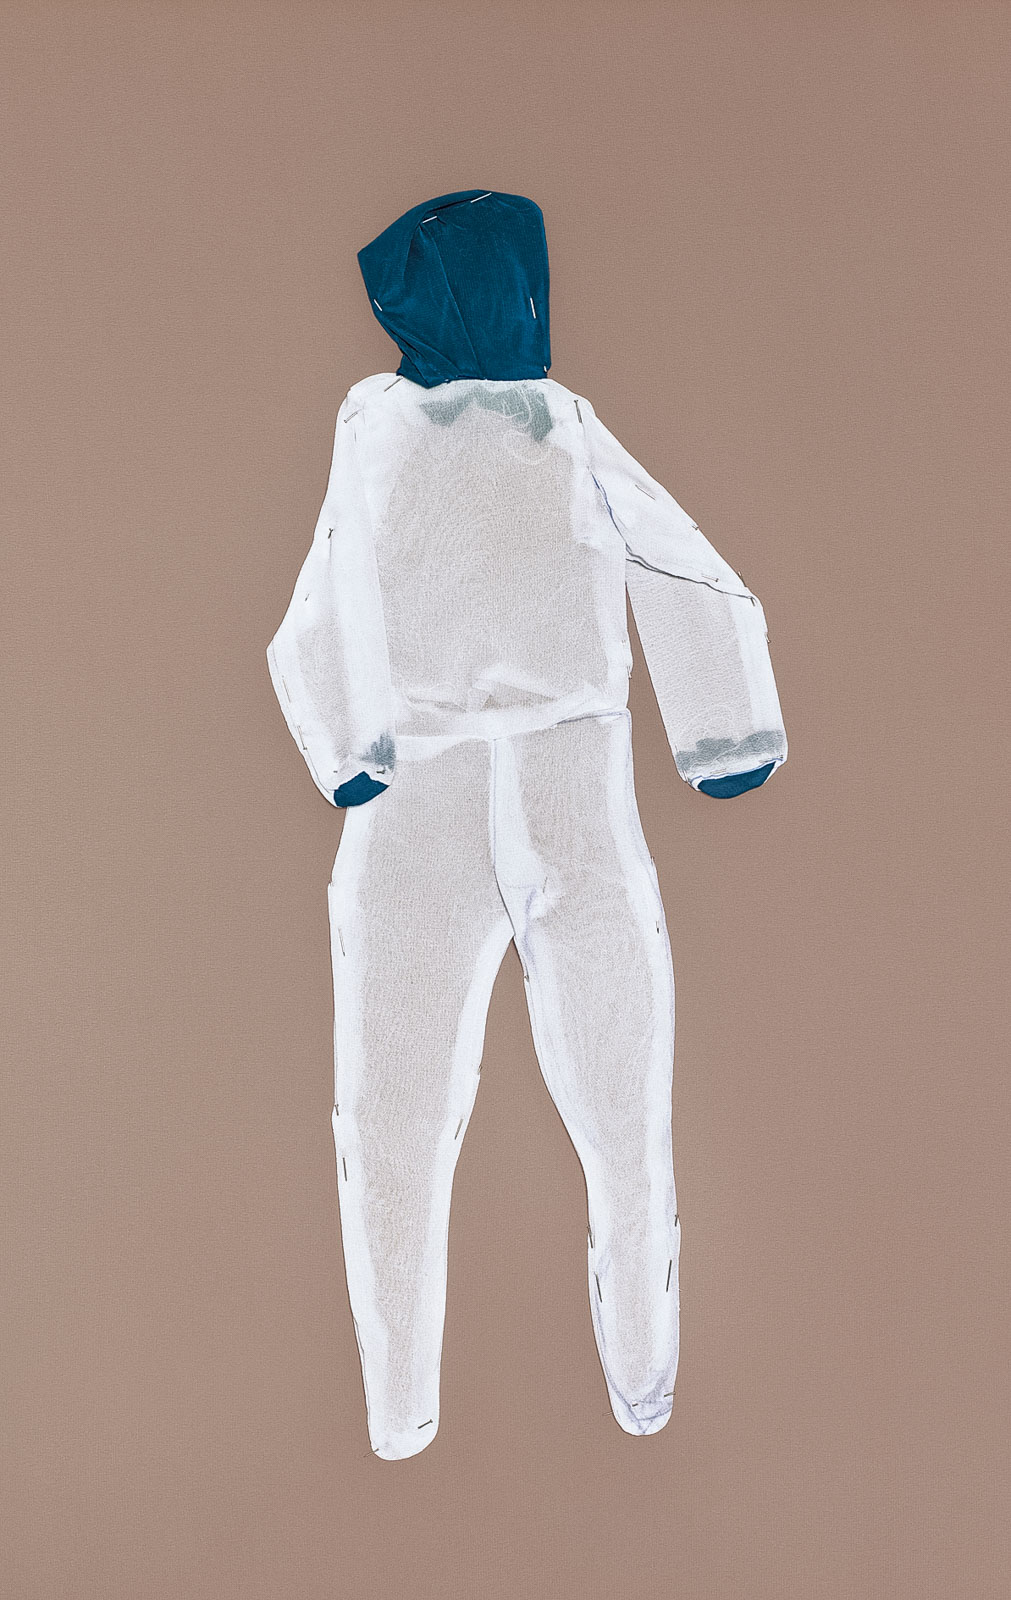 Éva Mag, Archive 2, 2015, Pigment print on acid-free cotton paper, 28 x 22 cm, Custom frame with museum glass, Edition 5 + 1 AP